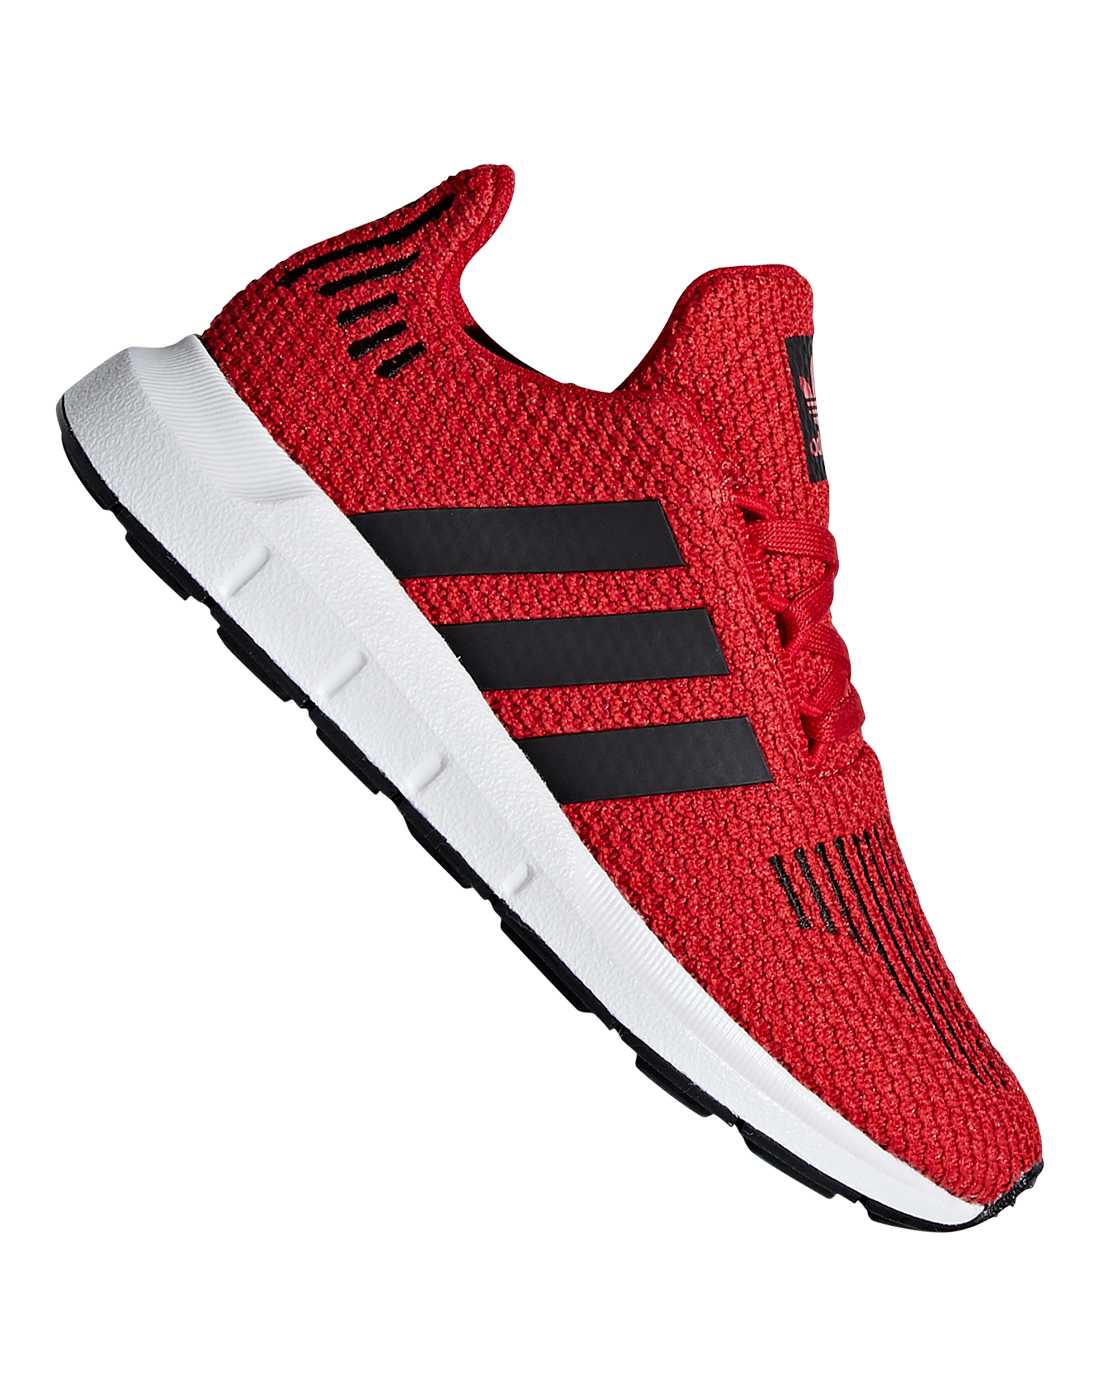 c2e8bb8f4aa33 Boy s Red adidas Originals Swift Runs